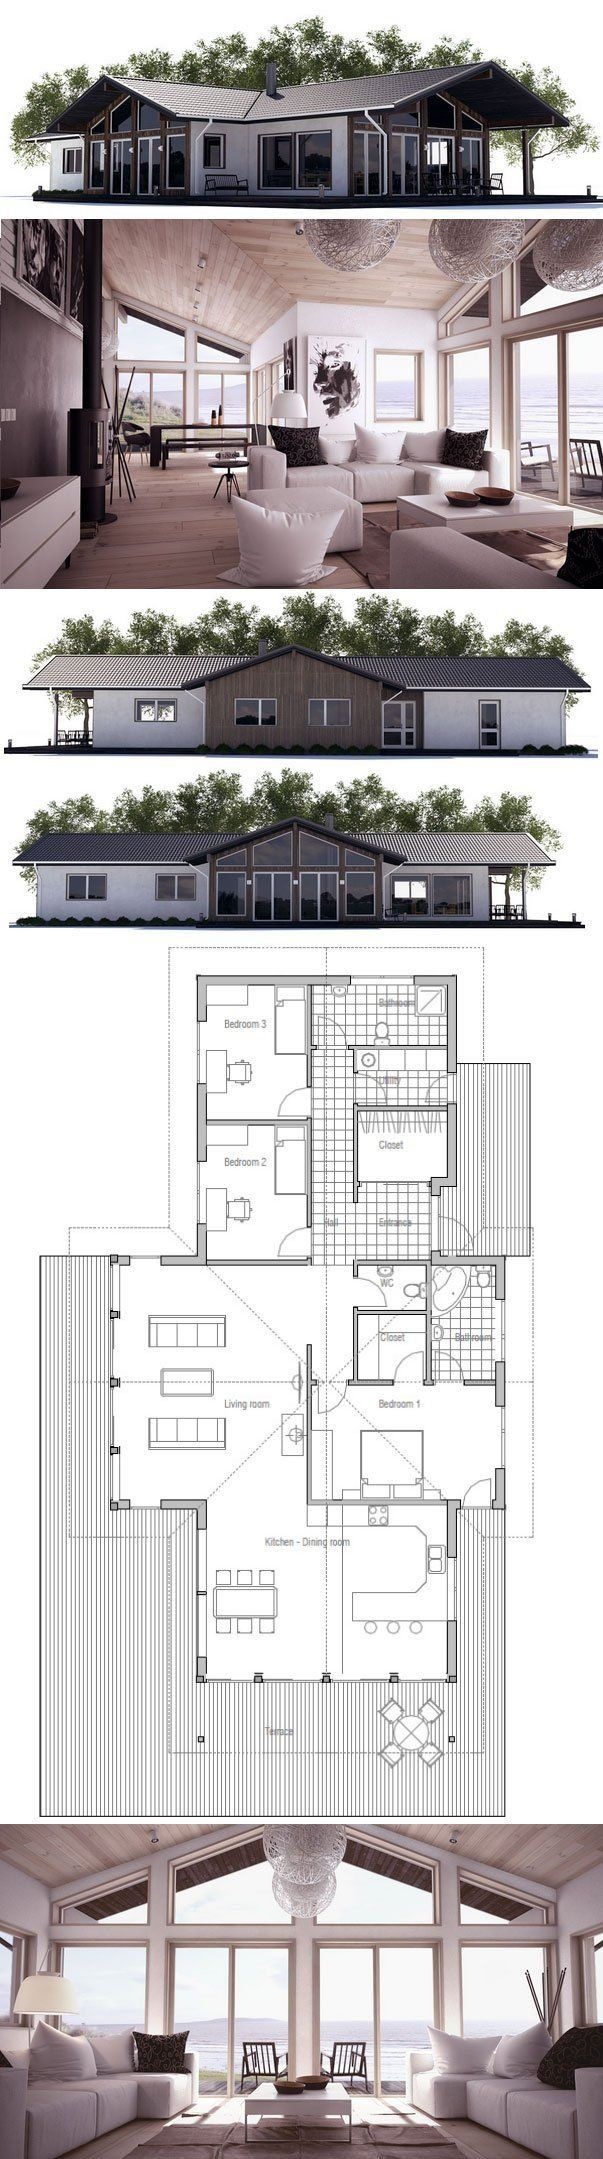 House Plan CH85 46 best Grunnmyndir images